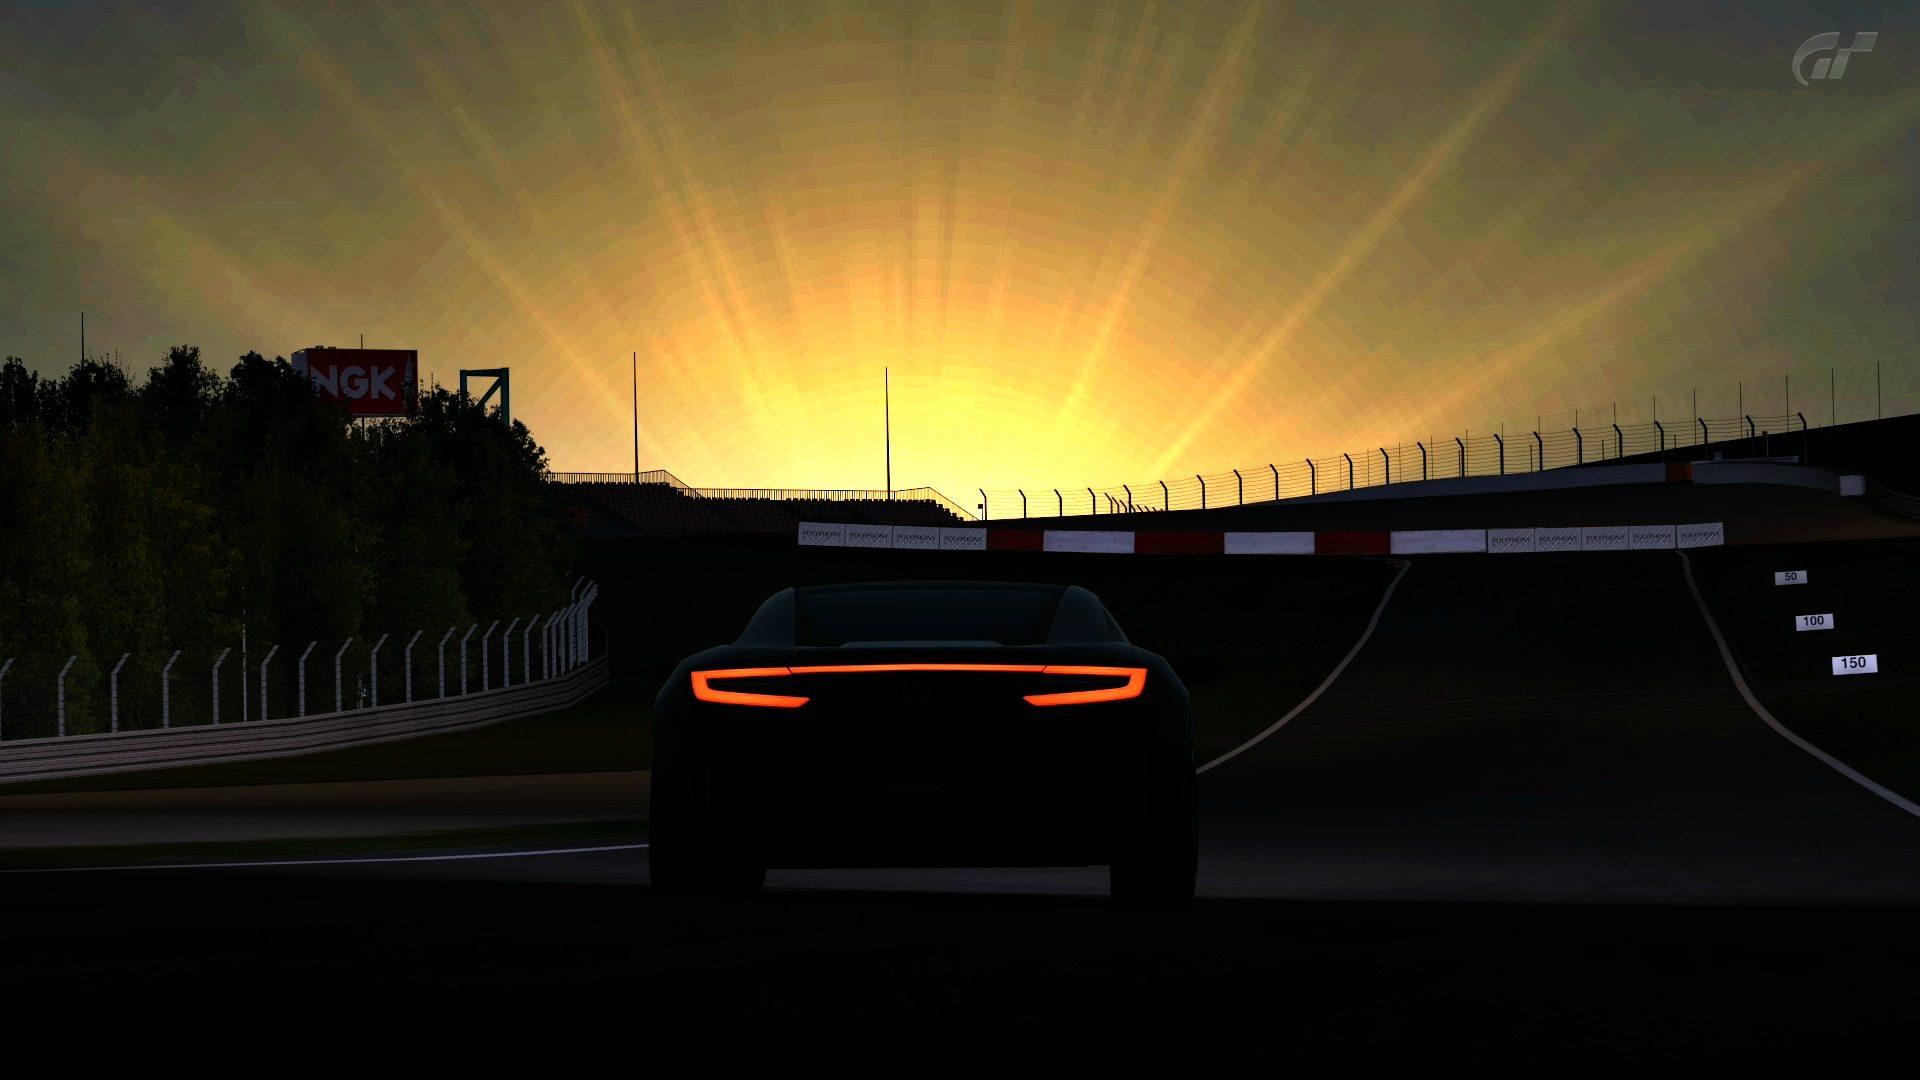 NrGP_D8-AcuraNSX1-Sunset1.jpg